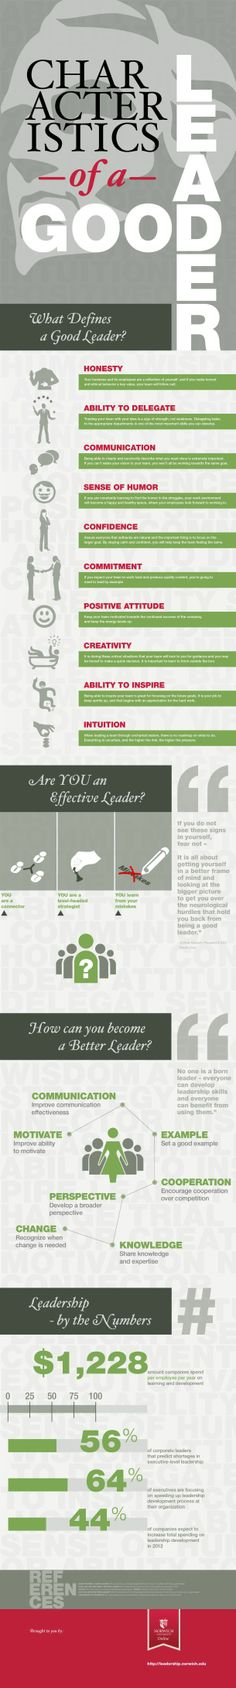 Characteristics of a good leader -SG